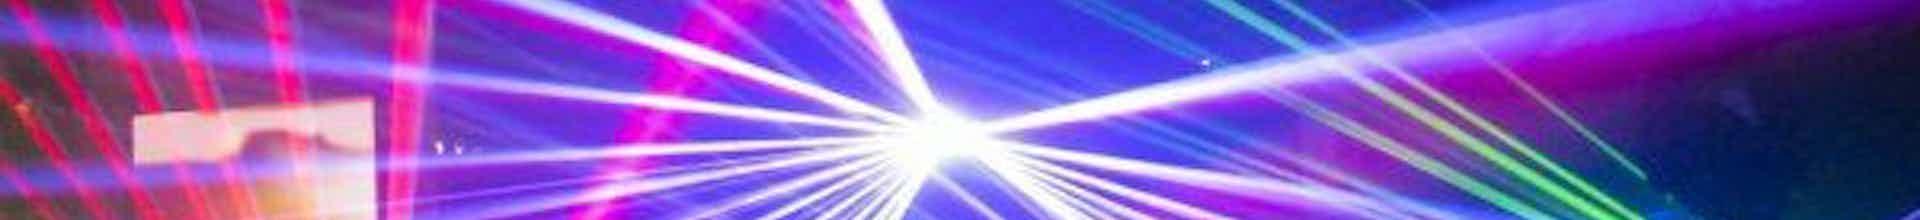 lasershow_0